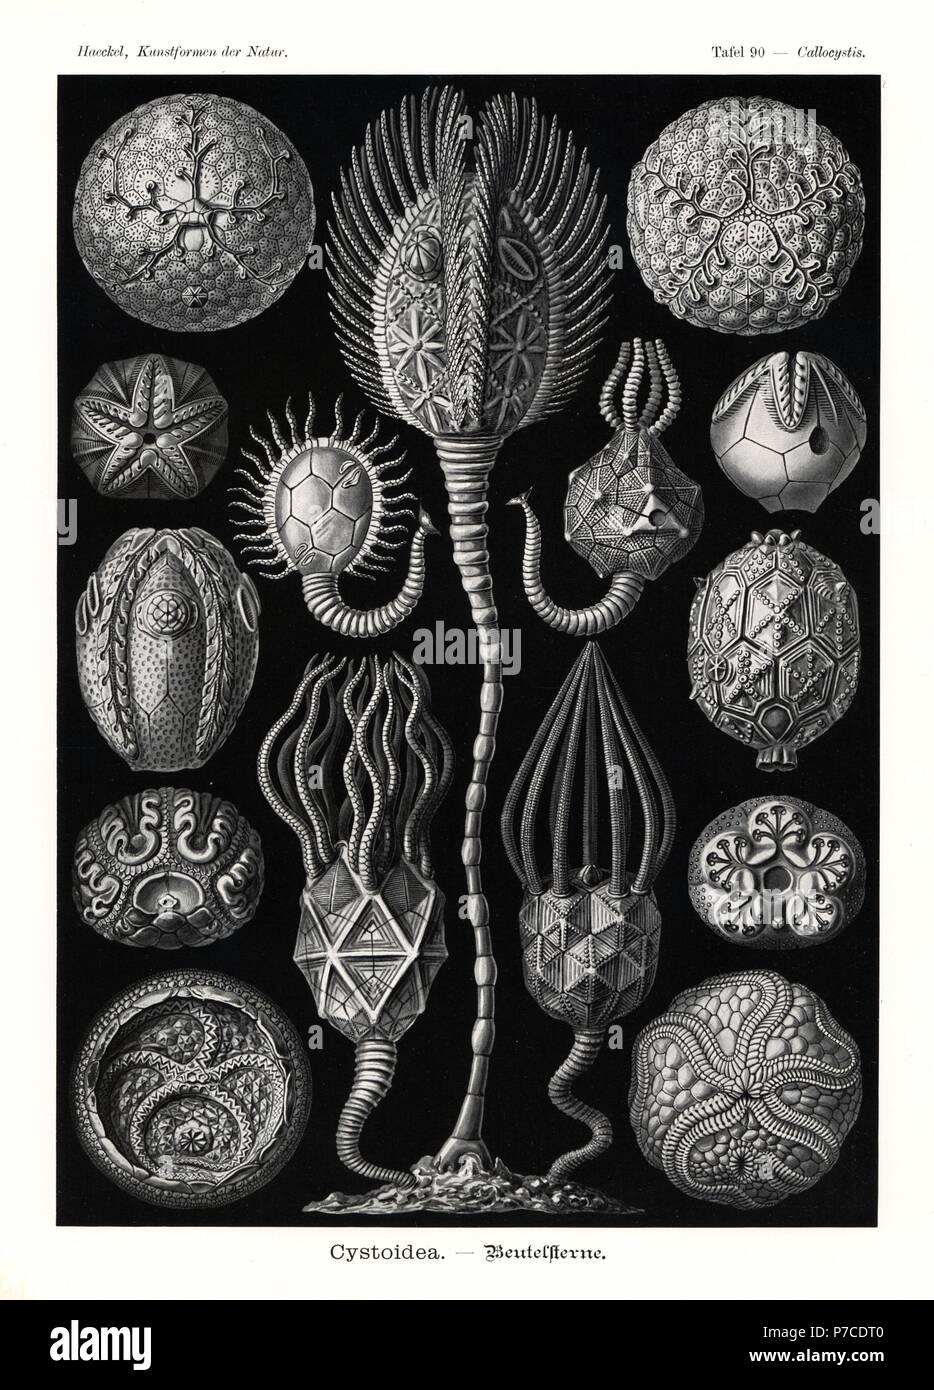 Cystoidea or cystoids, extinct fossil echinoderms: Staurocystis quadrifasciata 1, Glyptosphaerites leuchtenbergi 2, Protocrinites fragum 3, Cystoblastus leuchtenbergi 4,5, Pseudocrinites bifasciatus 6,  Echinoencrinites angulosus 7, Callocystites jewetti 8, Hemicosmites extraneus 9, Glyptocystites multiporus 10, Glyptocystites species 11, Cheirocrinus species 12, Caryocrinites ornatus 13, Agelacrinites hamiltonensis 14, and Streptaster vorticellatus 15. Chromolithograph by Adolf Glitsch from an illustration by Ernst Haeckel from Art Forms in Nature, Kunstformen der Natur, Liepzig, Germany, 190 Stock Photo